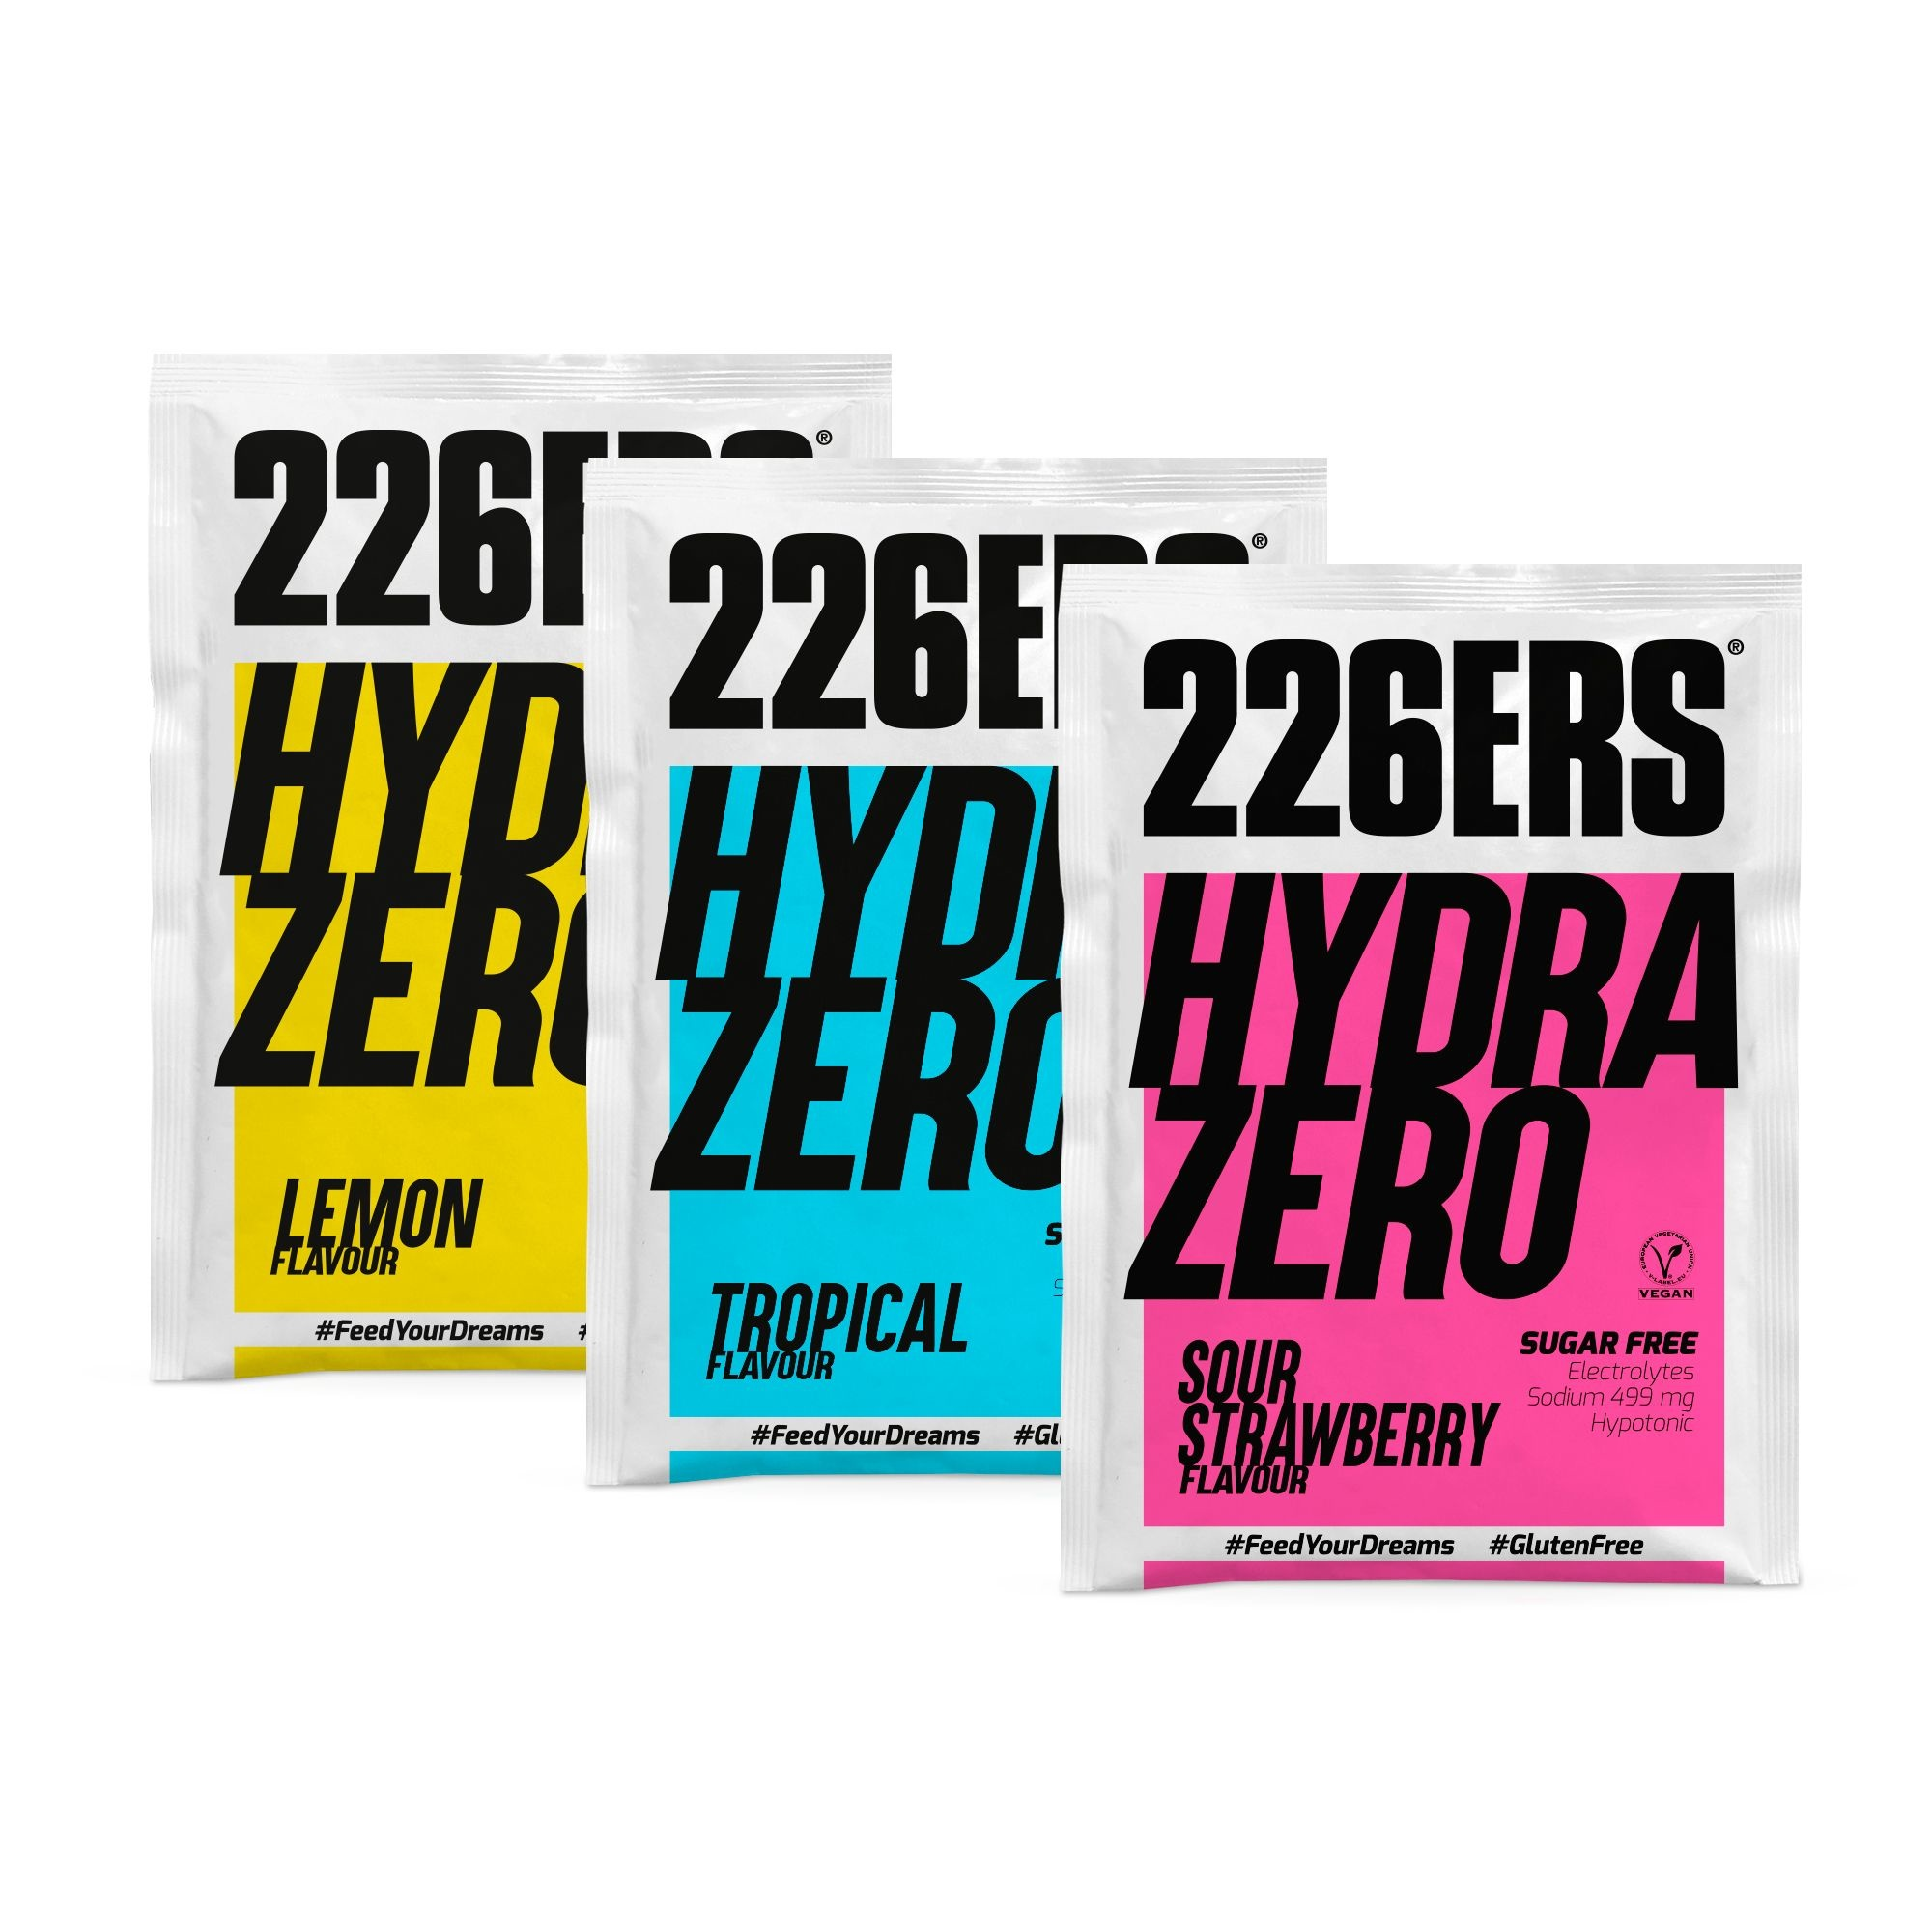 226ERS | Hydrazero Drink | Sachet-2